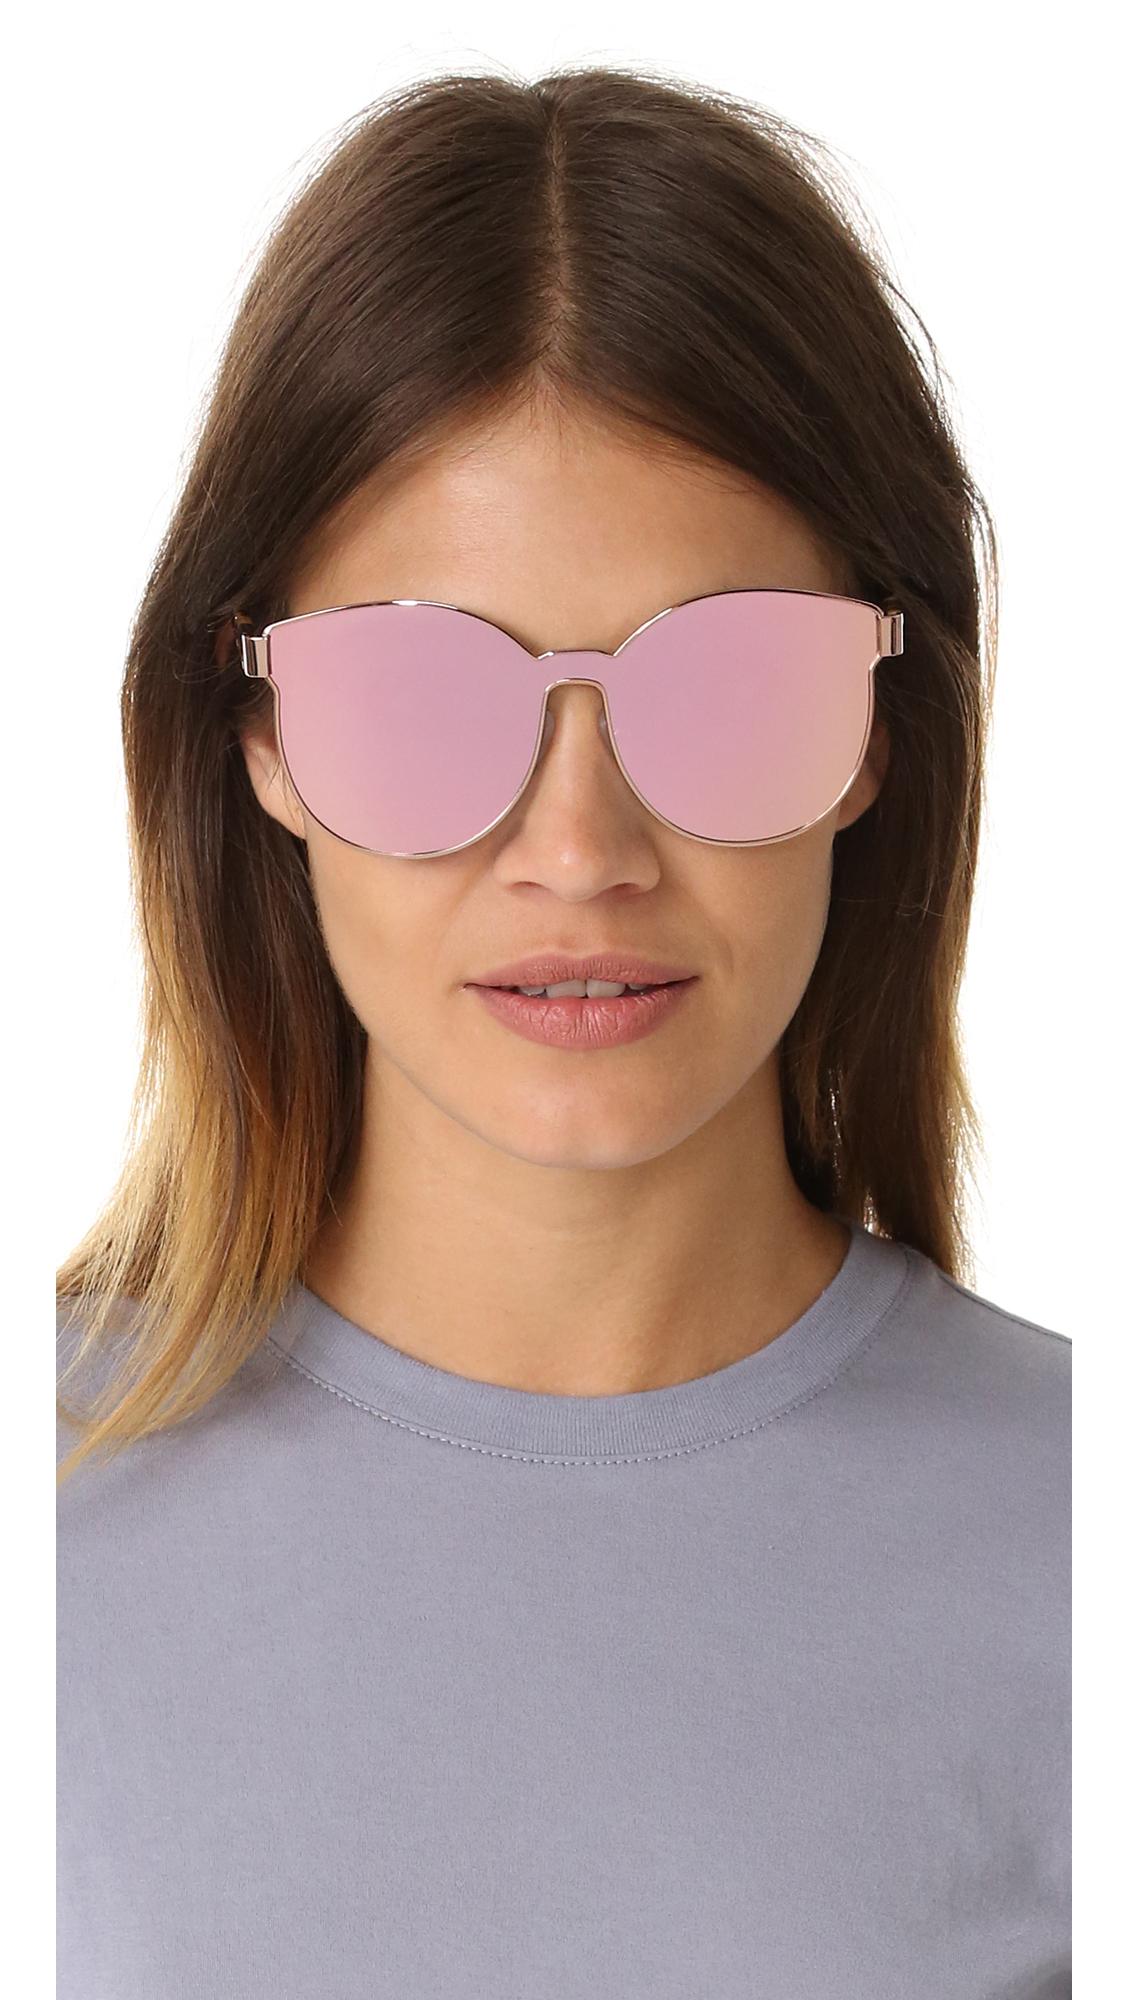 b664c8edd291 Karen Walker Star Sailor Superstar Sunglasses